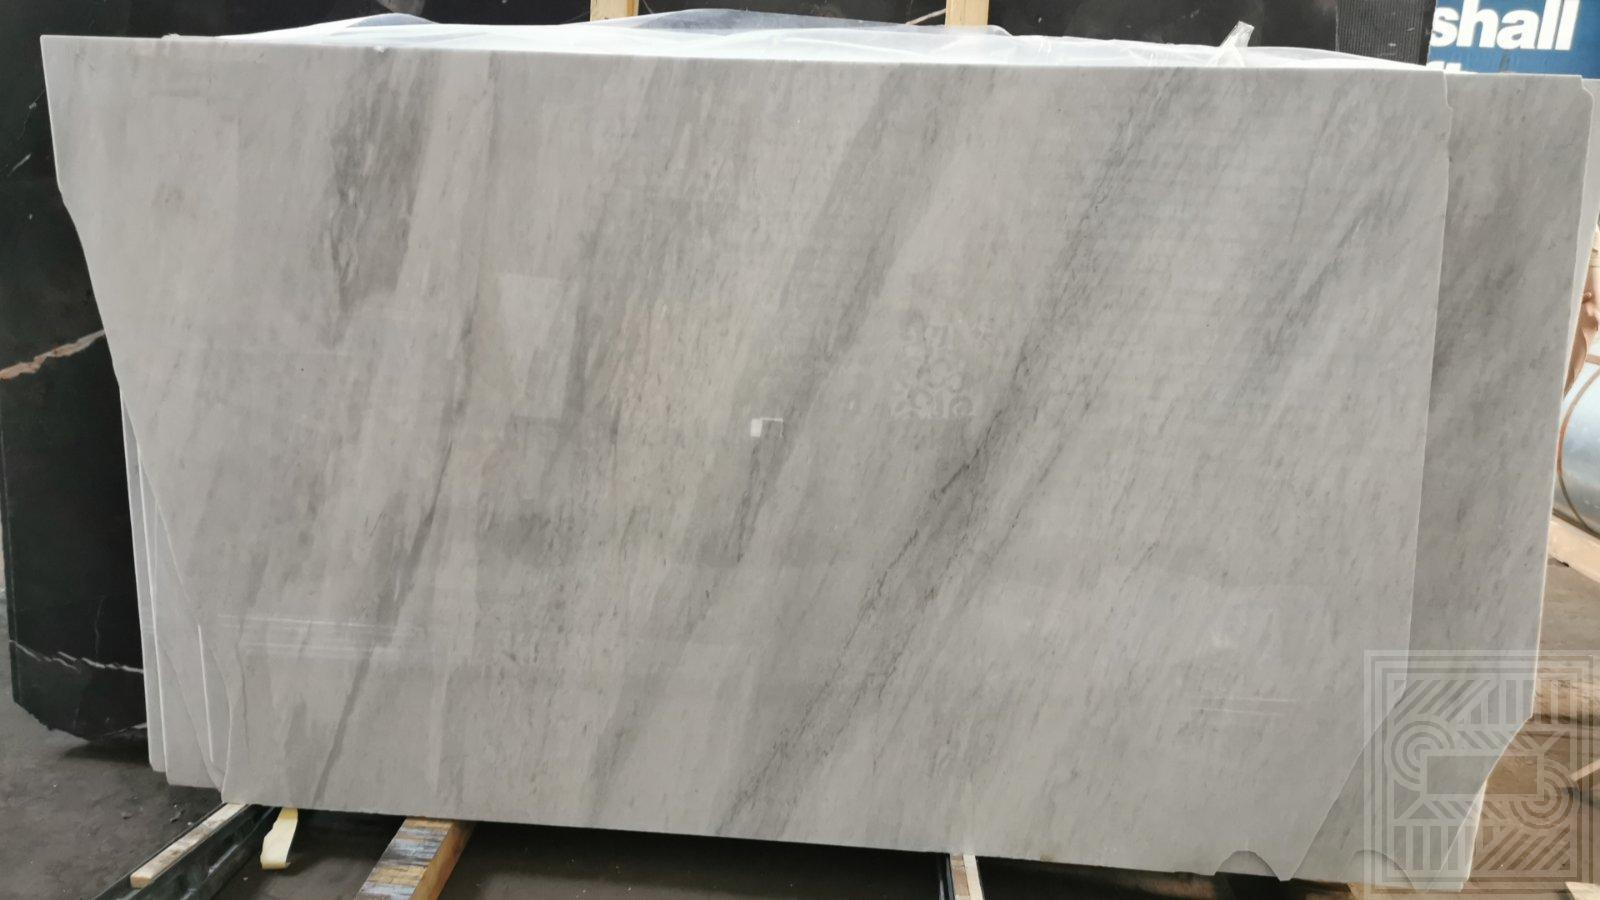 Bianco Carrara (20 mm) light-marble - Bianco Carrara 20 mm